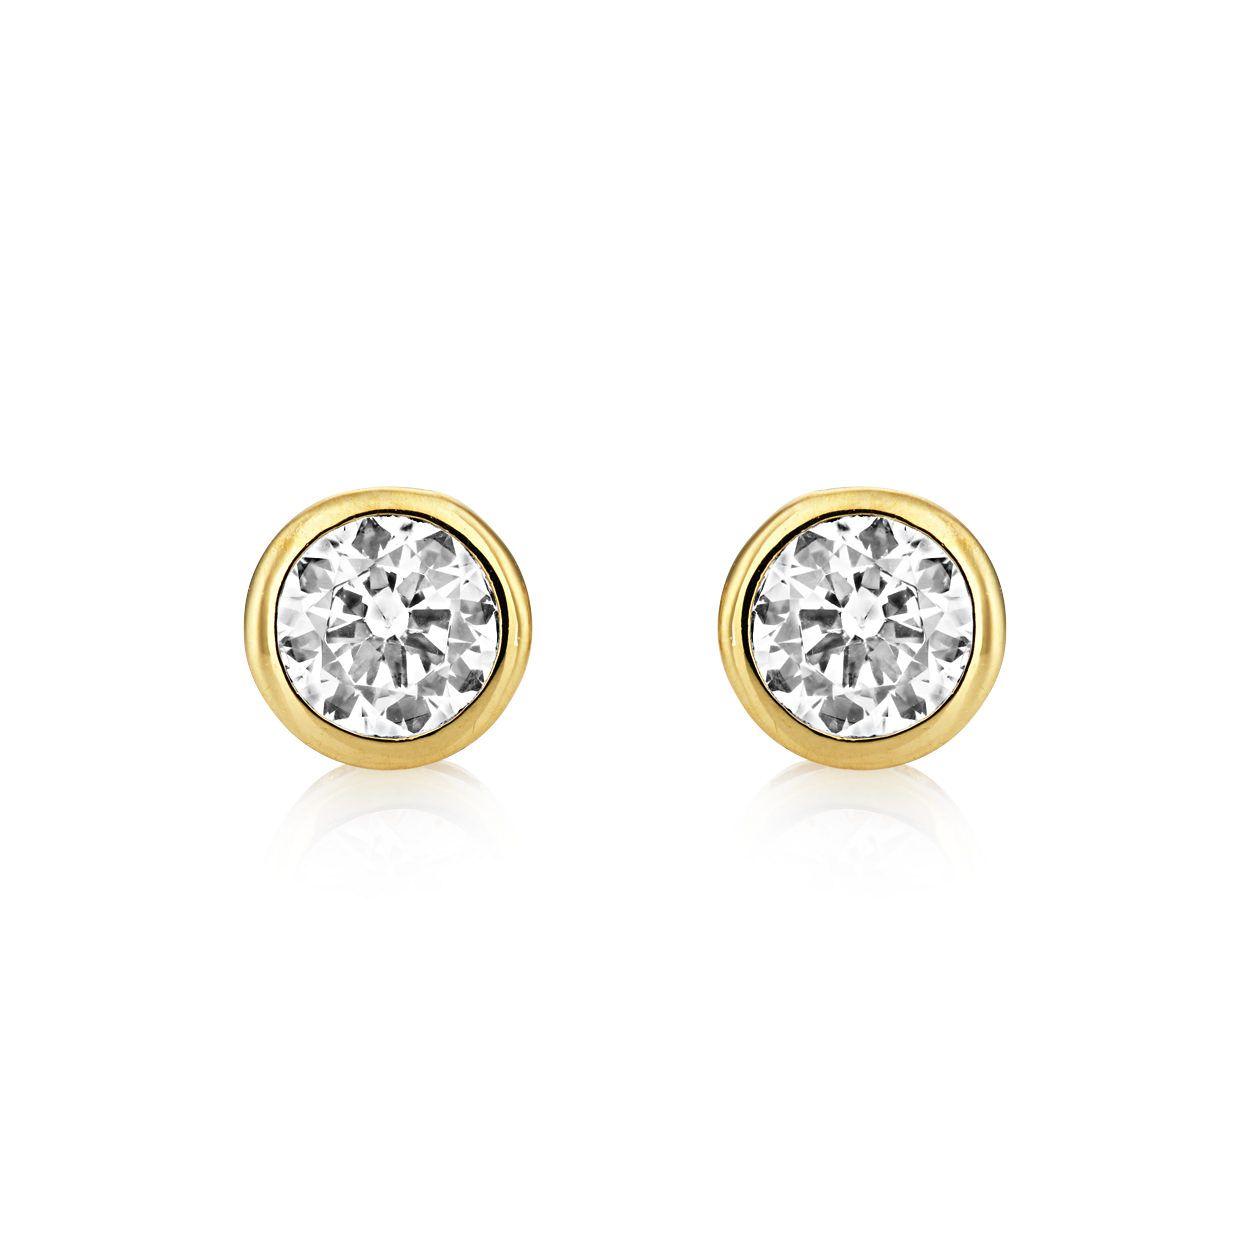 Buckley London Central Brilliant Stud Earrings - Gold